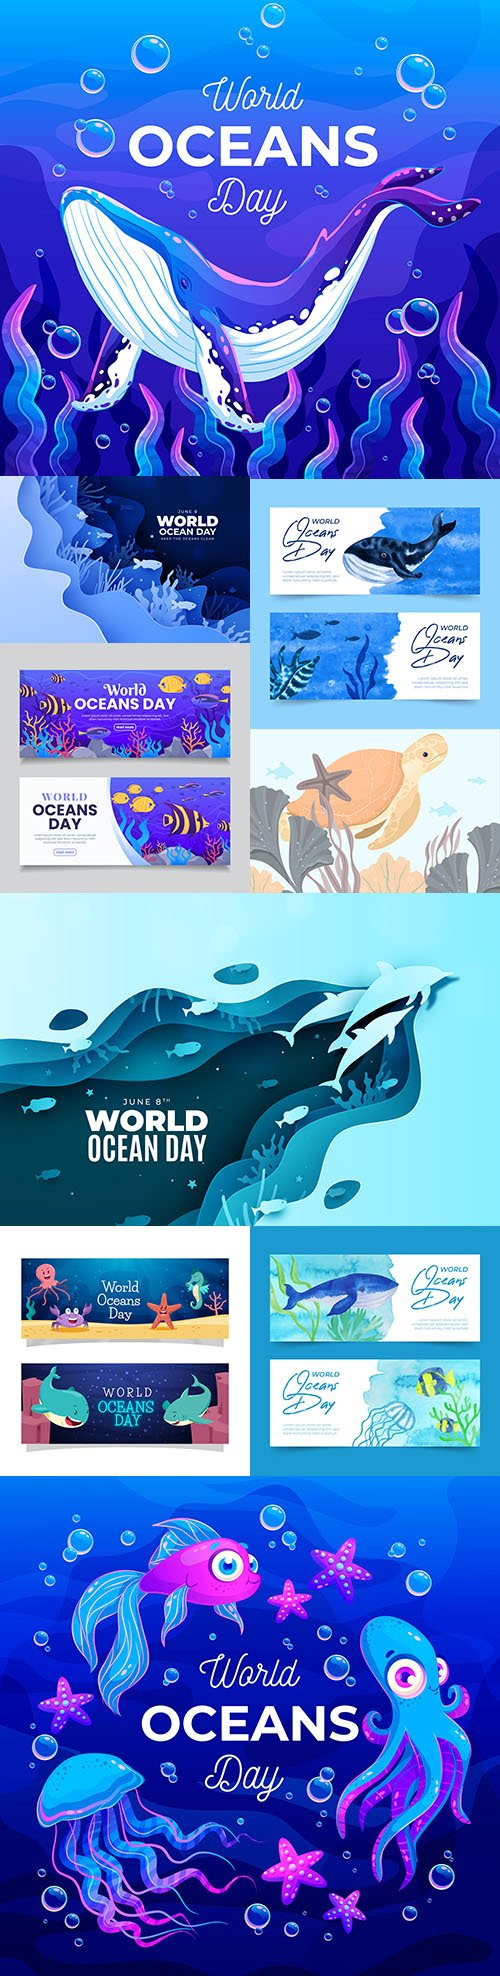 World ocean day with marine dwellers cartoon illustrations